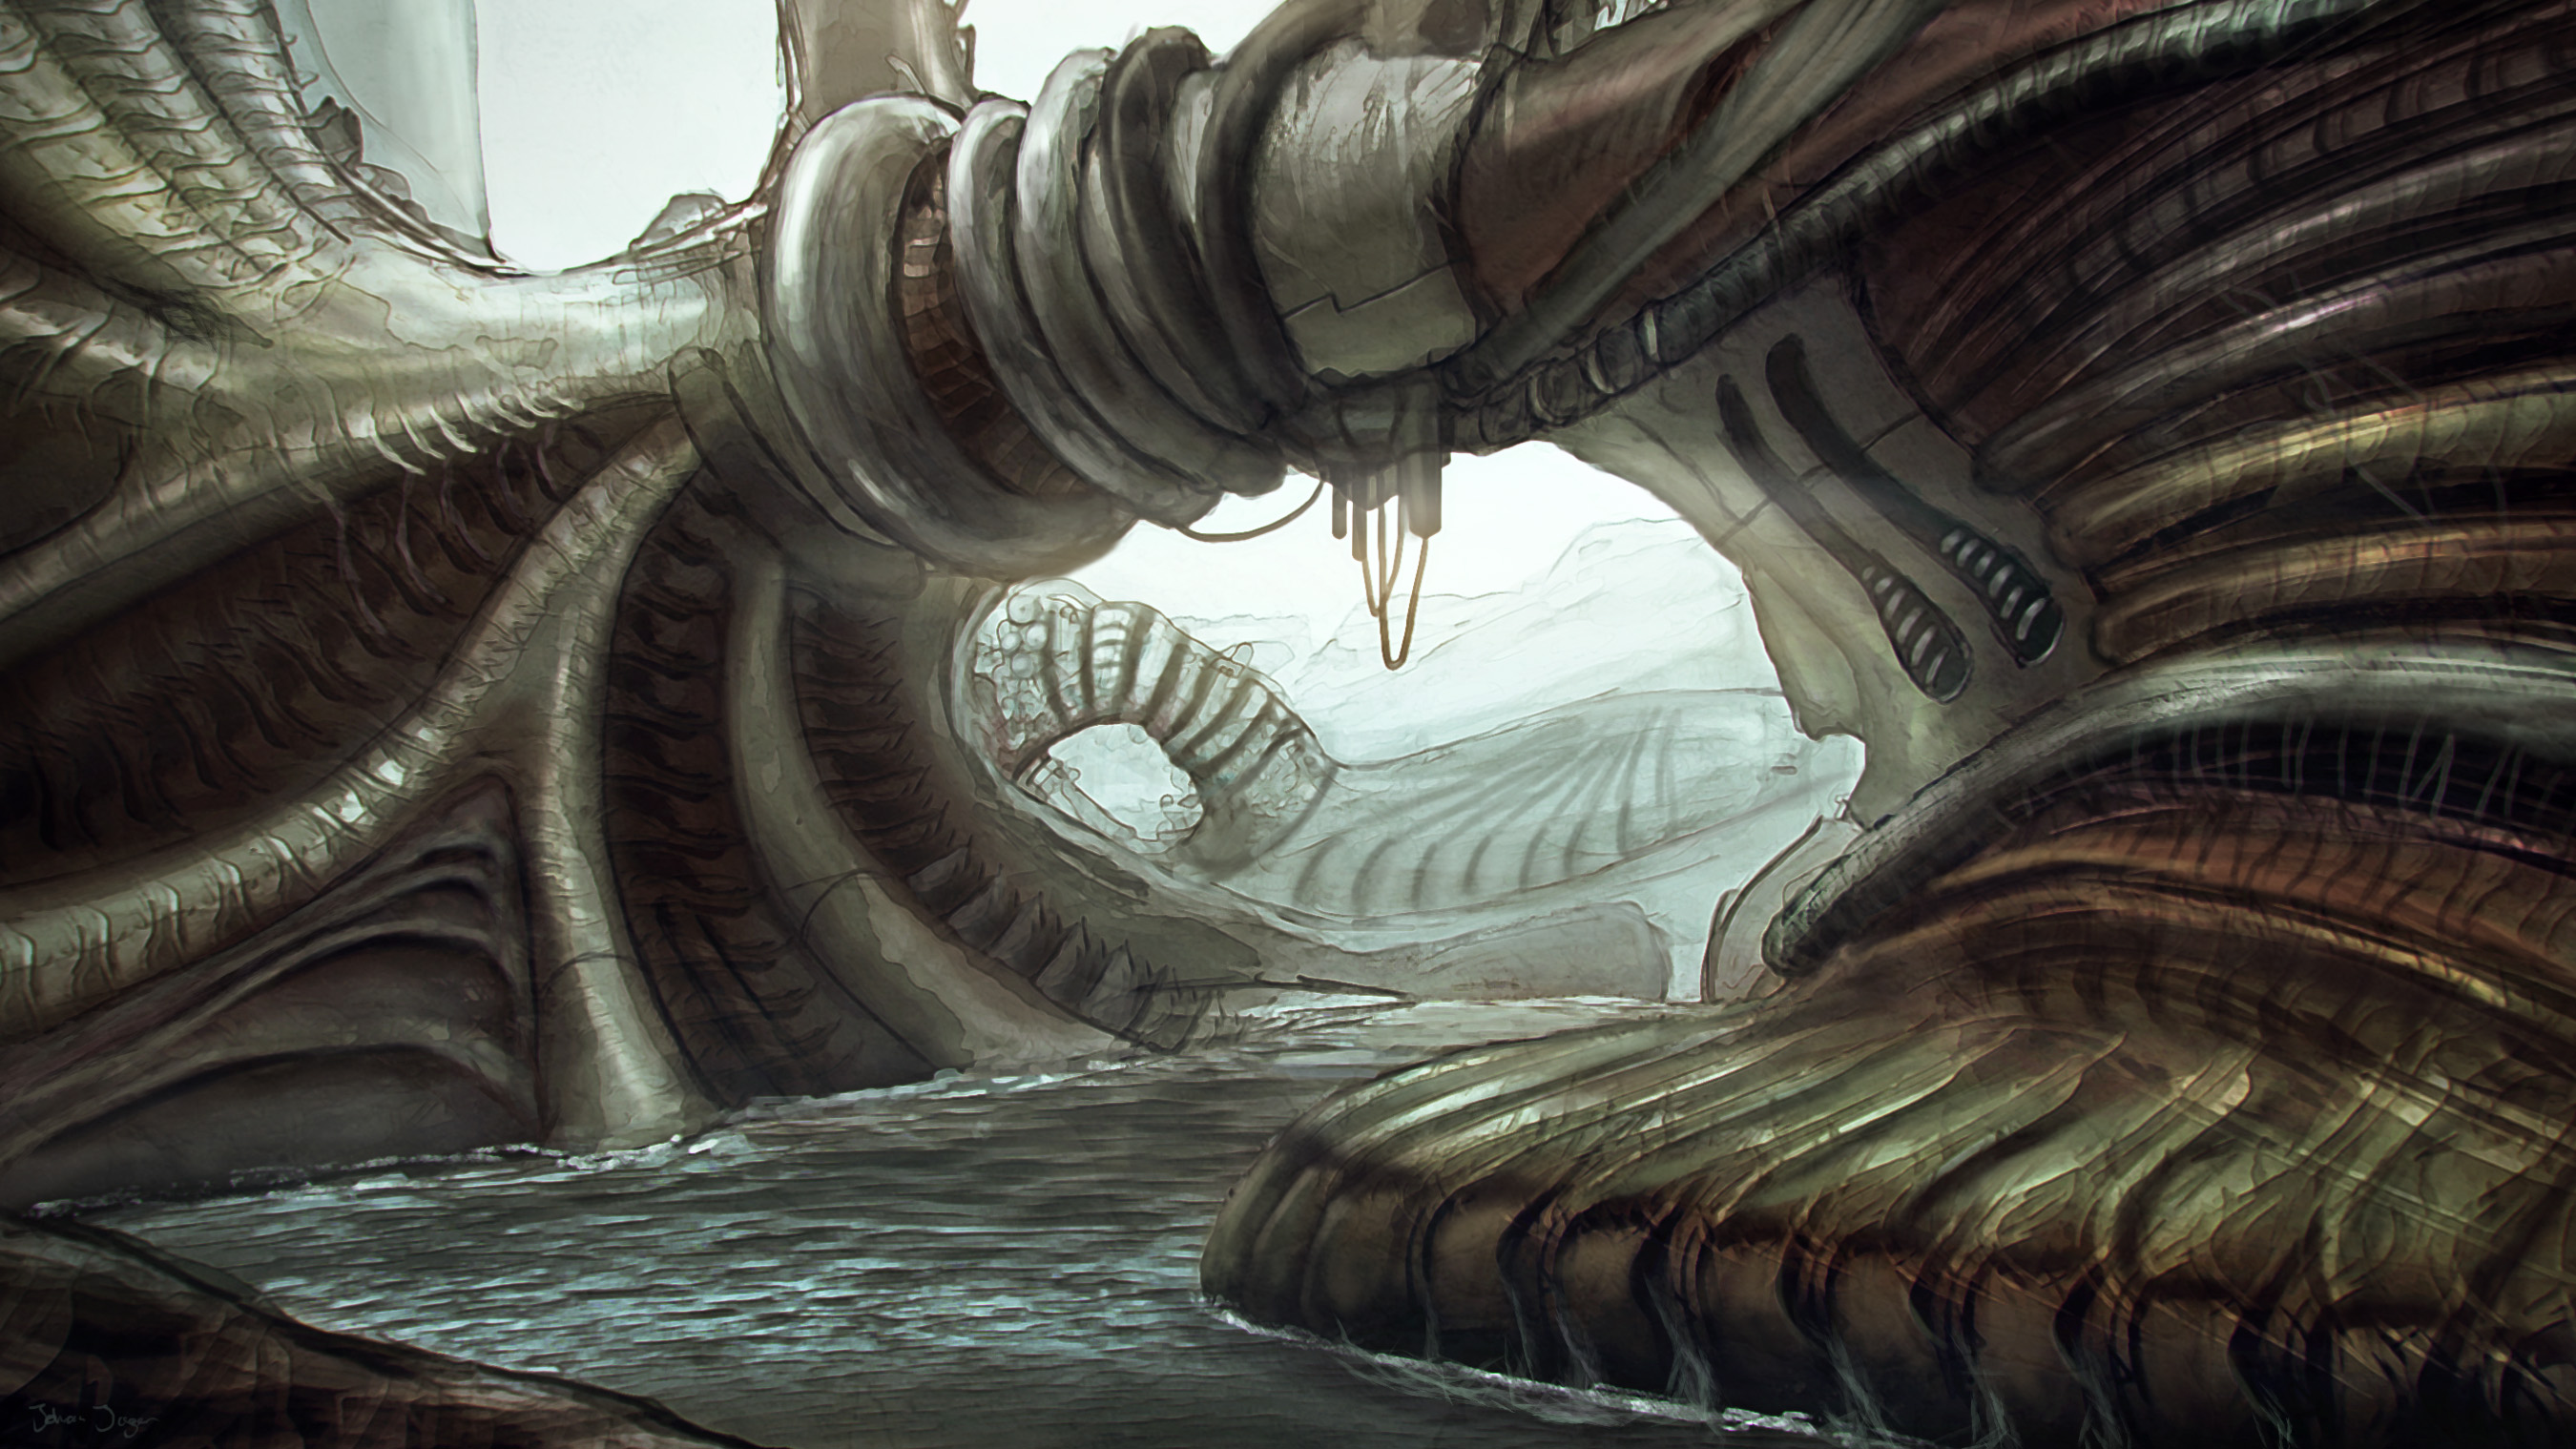 Biomechanical Environment by JohanJaeger